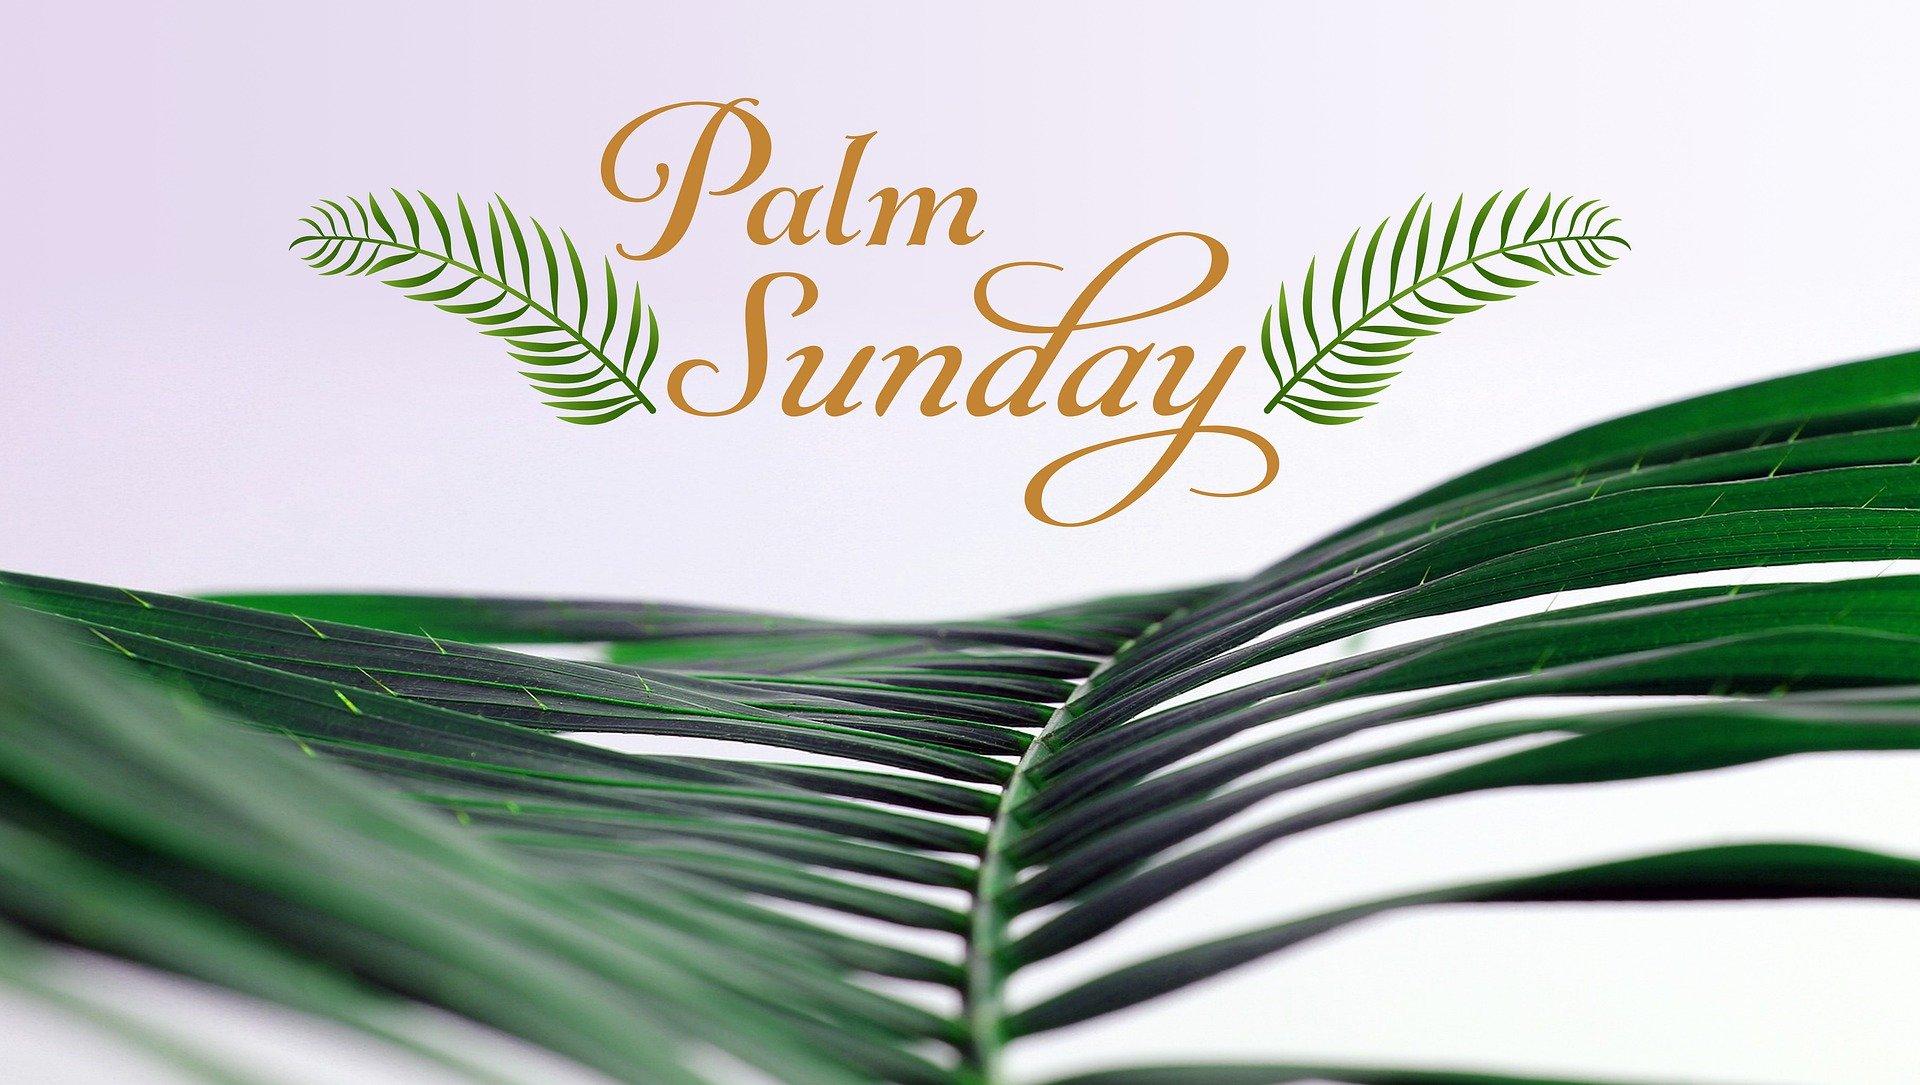 Palm Sunday banner